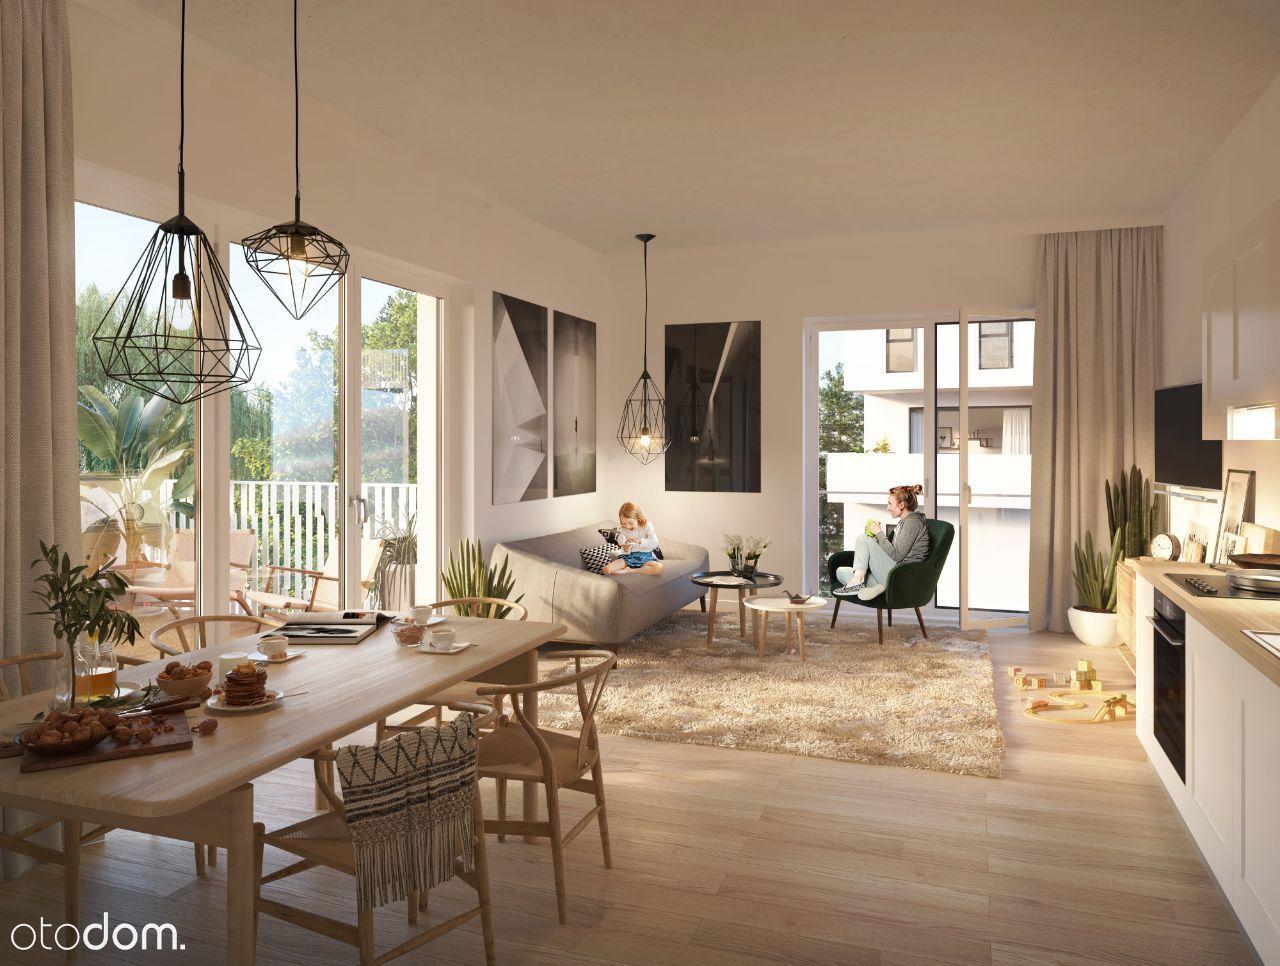 Bacciarellego 54 | funkcjonalne mieszkanie E.2.8